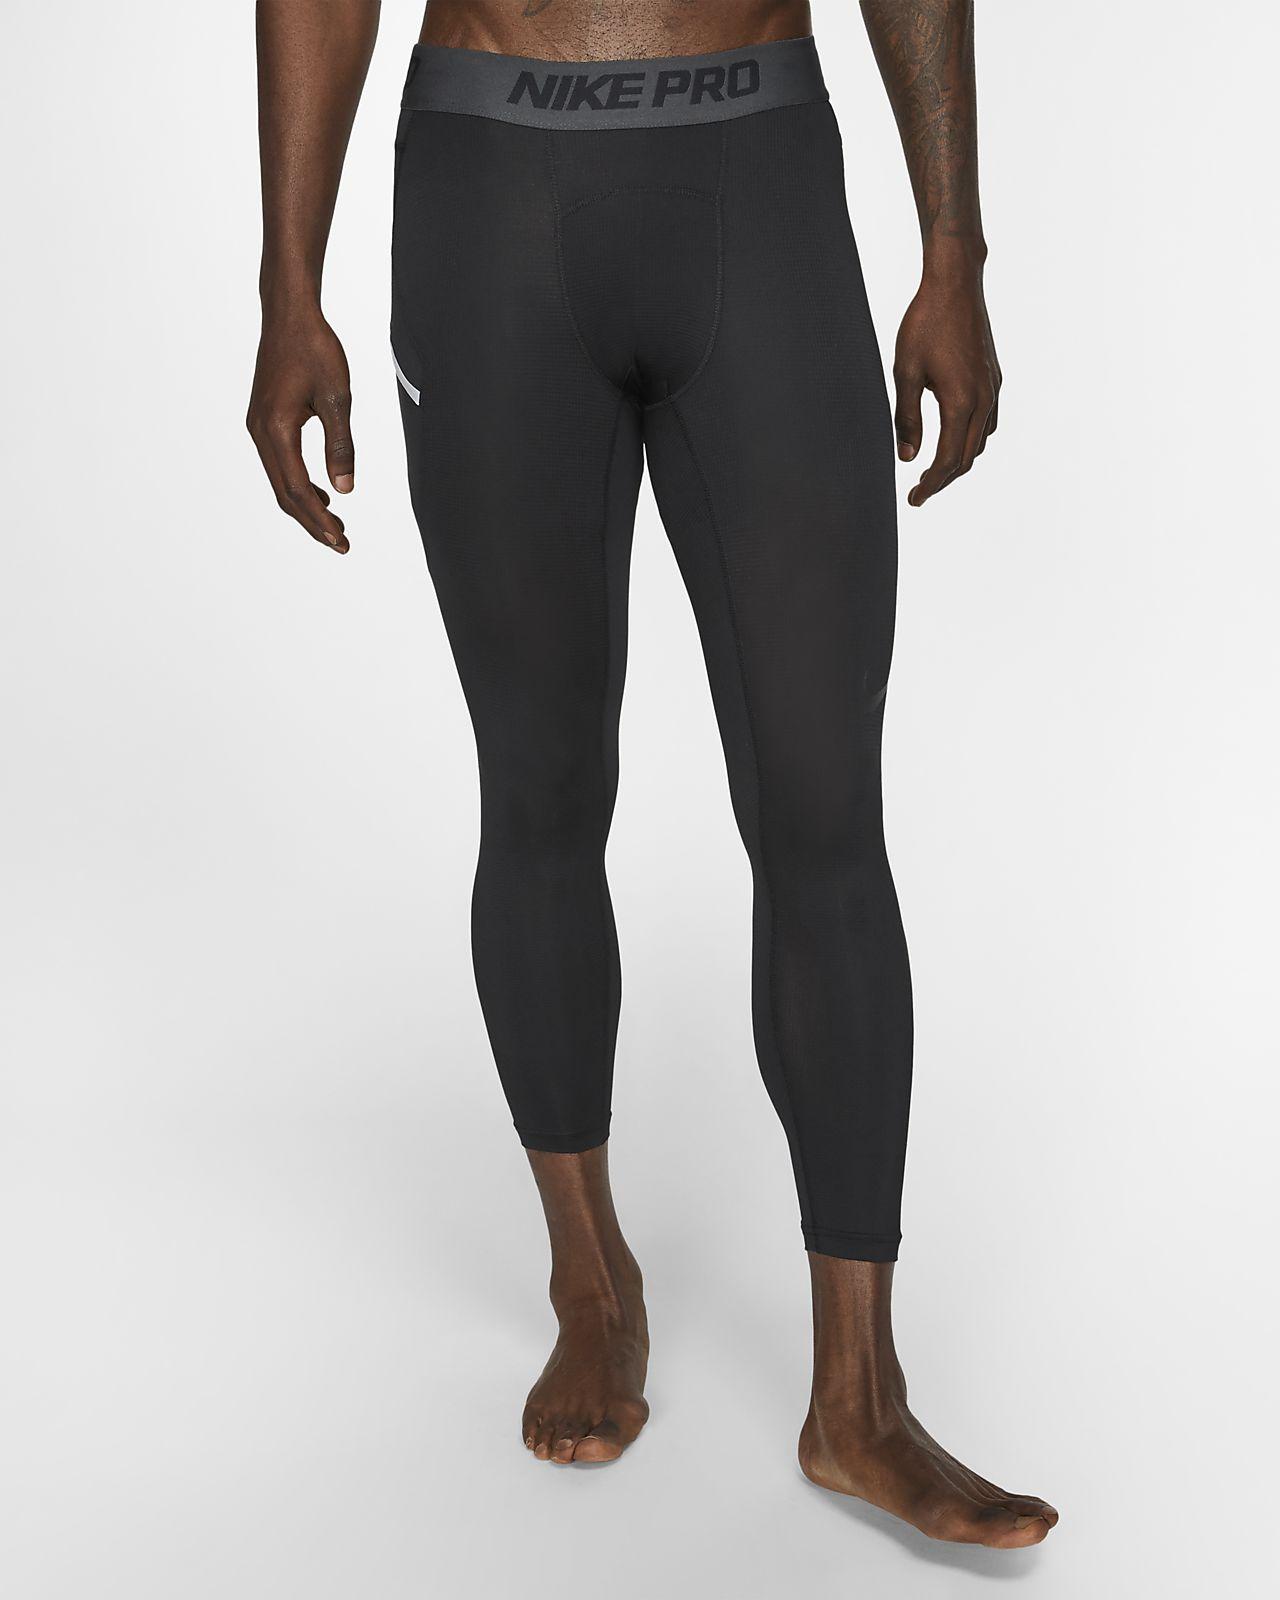 Legging de basketball 3/4 Nike Pro pour Homme